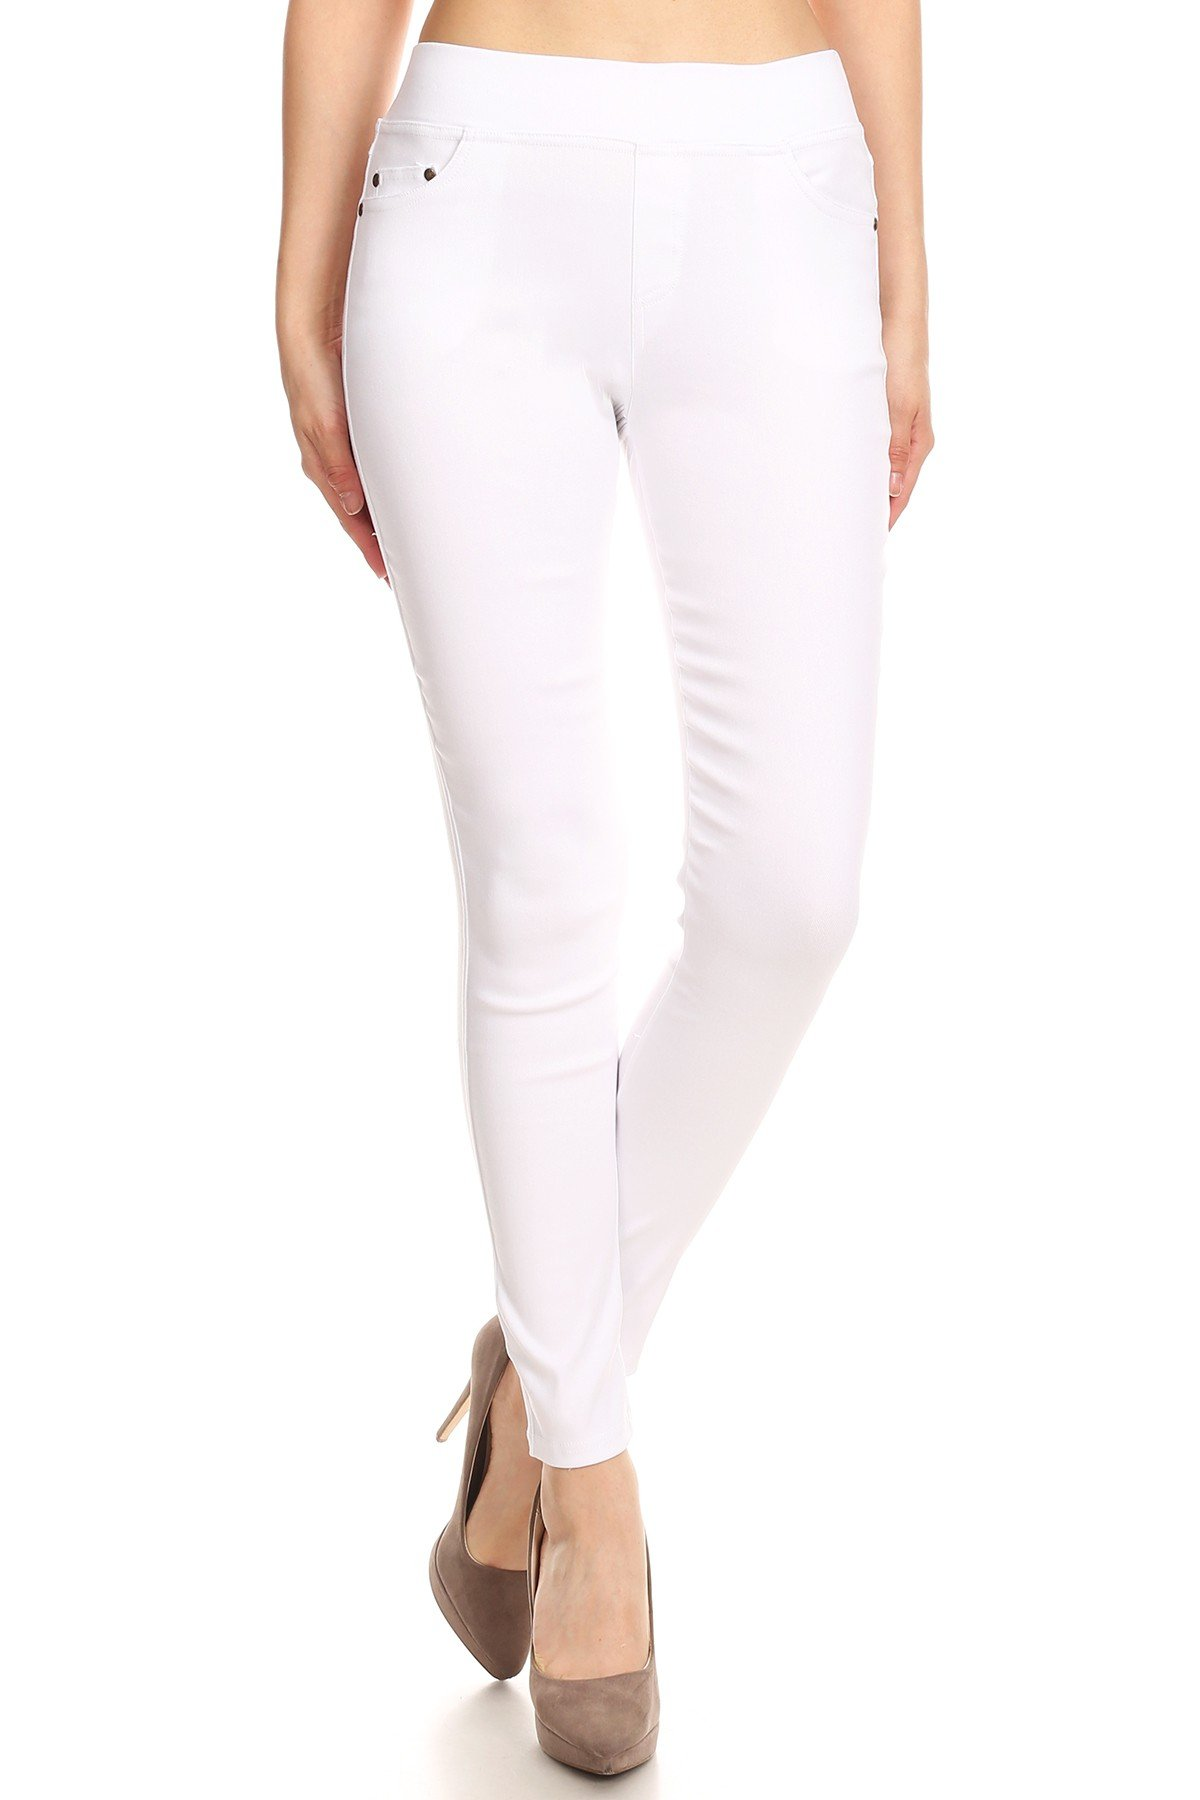 MissMissy Women's Casual Color Denim Slim Fit Skinny Elastic Waist Band Spandex Jeggings Ankle Jeans Pants (Small, White)